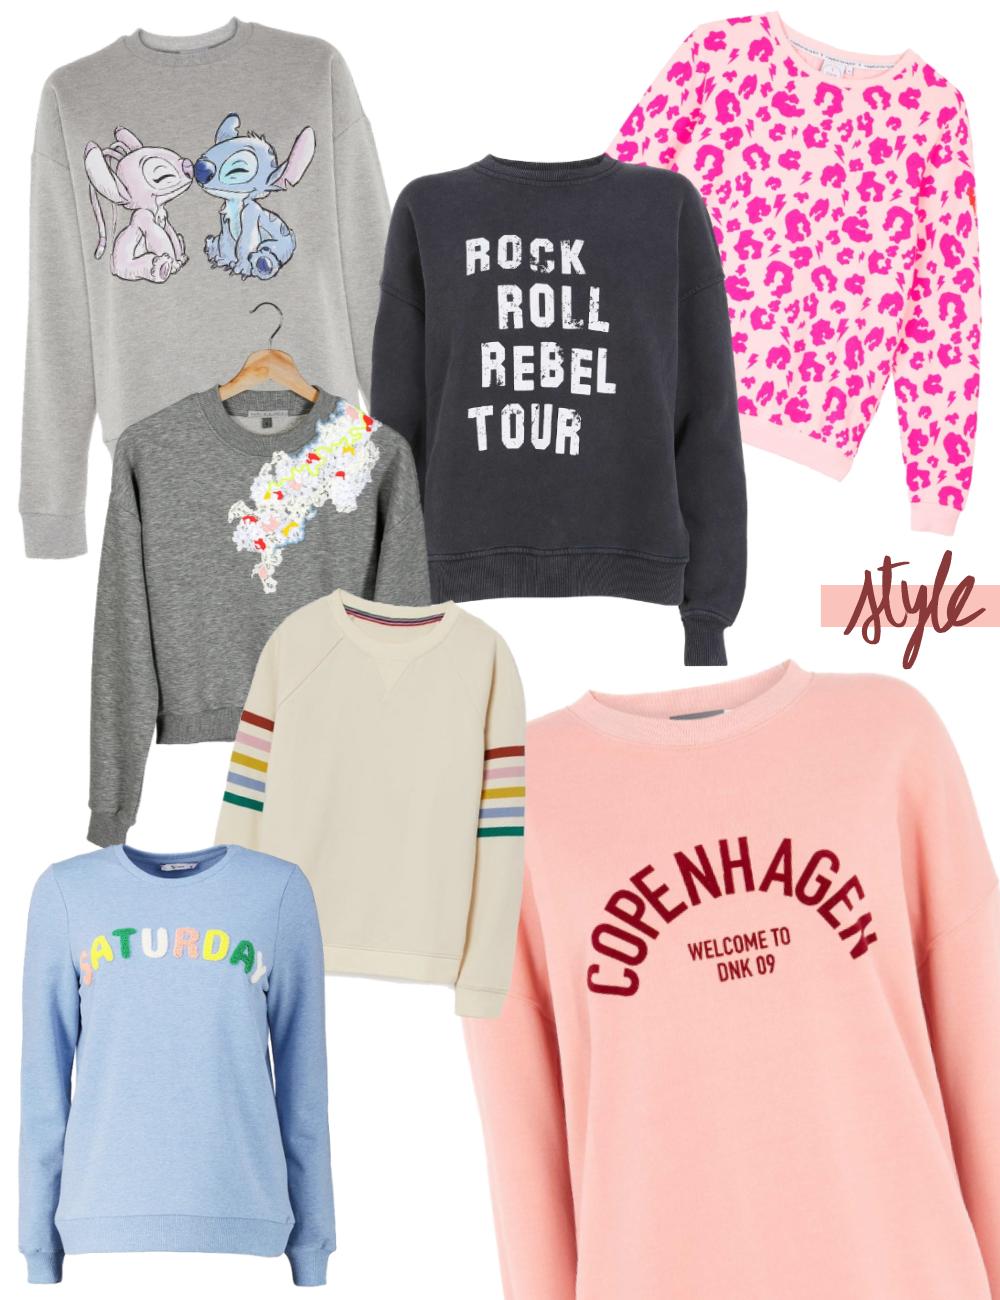 The Sweatshirt - my top picks